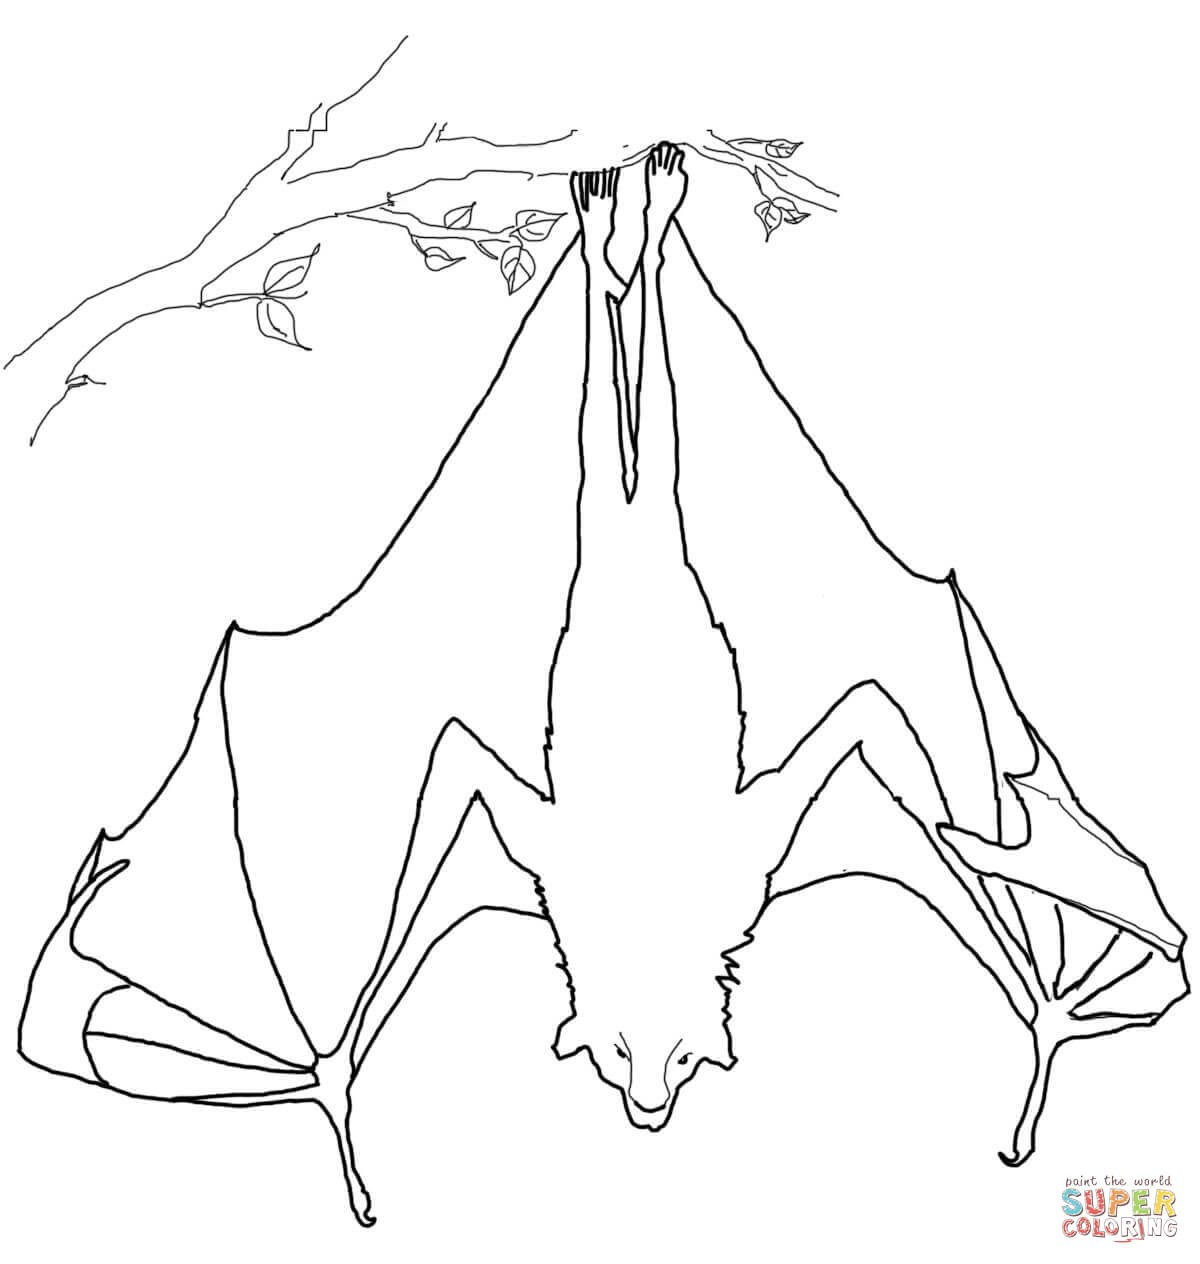 1200x1264 Promising Bats Coloring Pages Bat Preschool Best Of Surprising